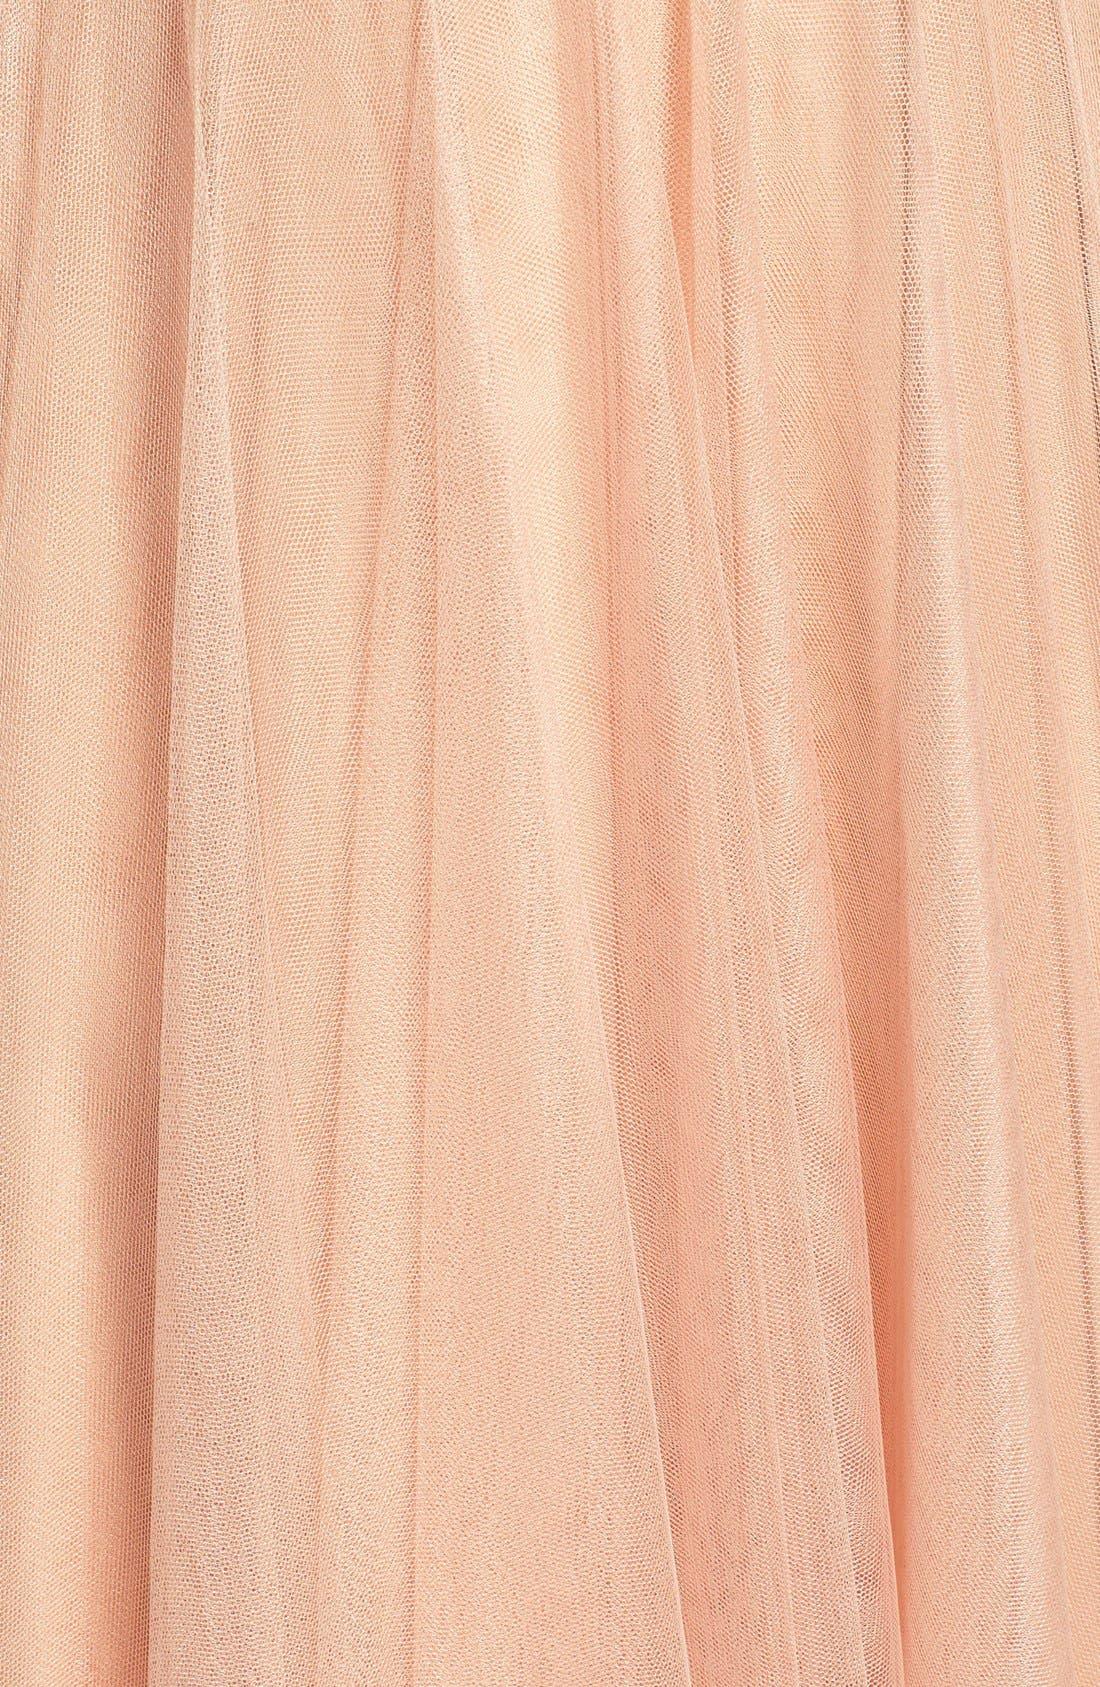 Brielle Tulle Gown,                             Alternate thumbnail 6, color,                             Blush